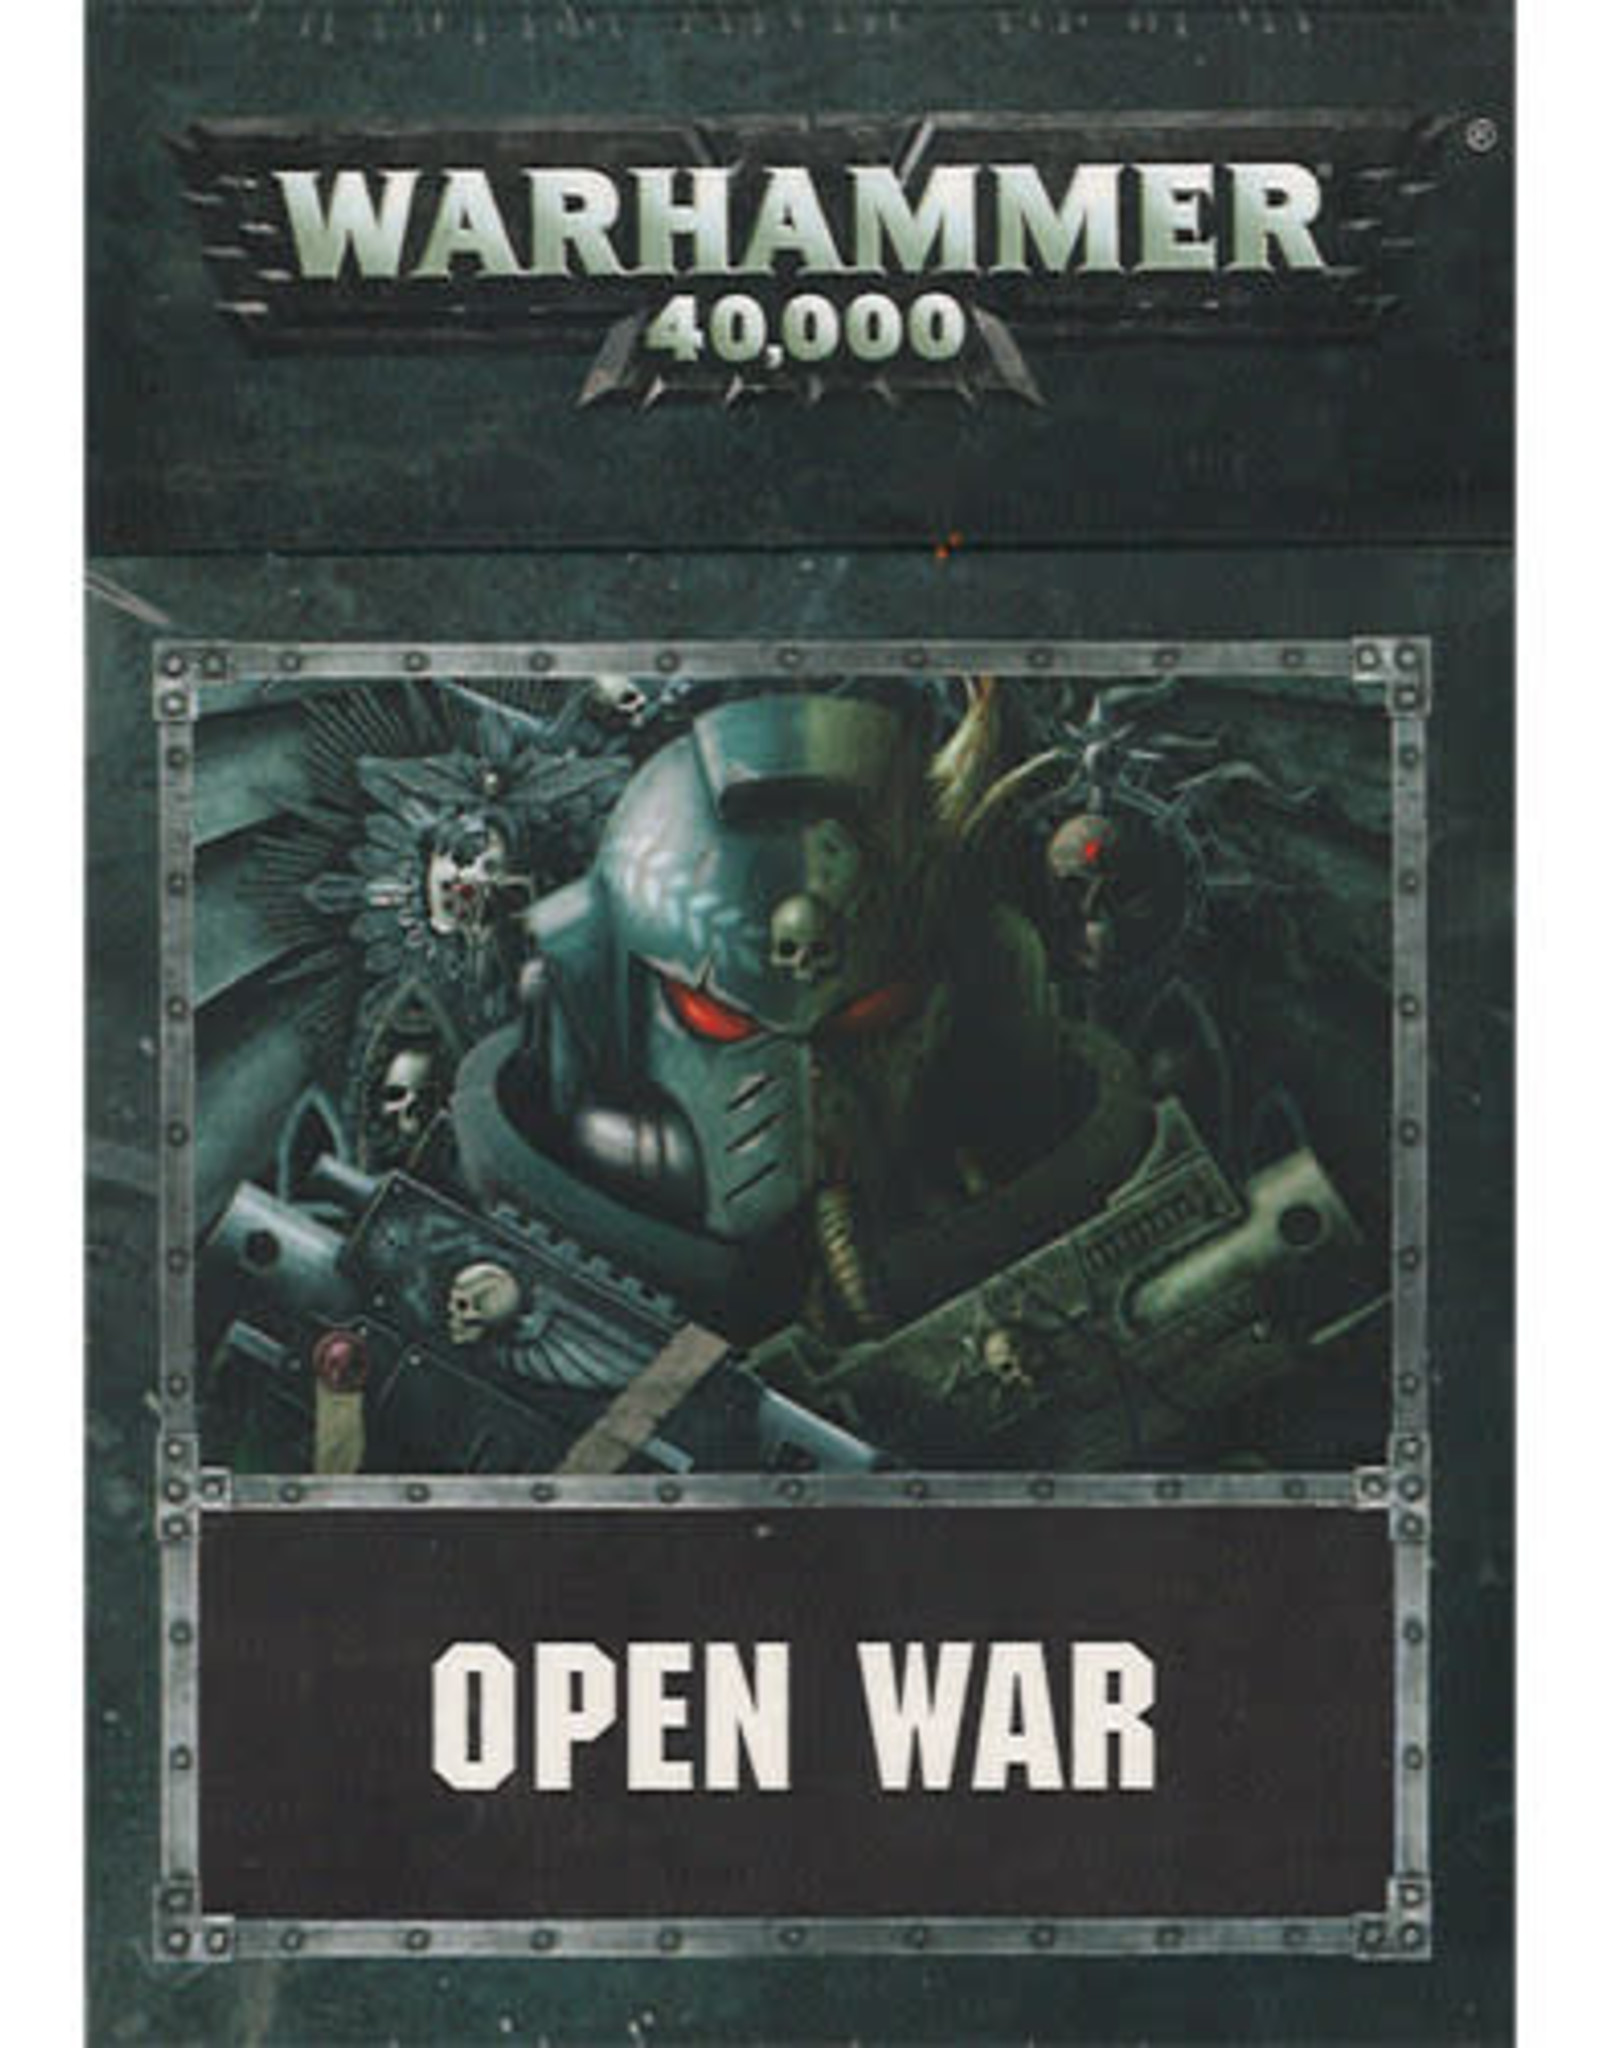 Warhammer 40K 40K Open War Cards